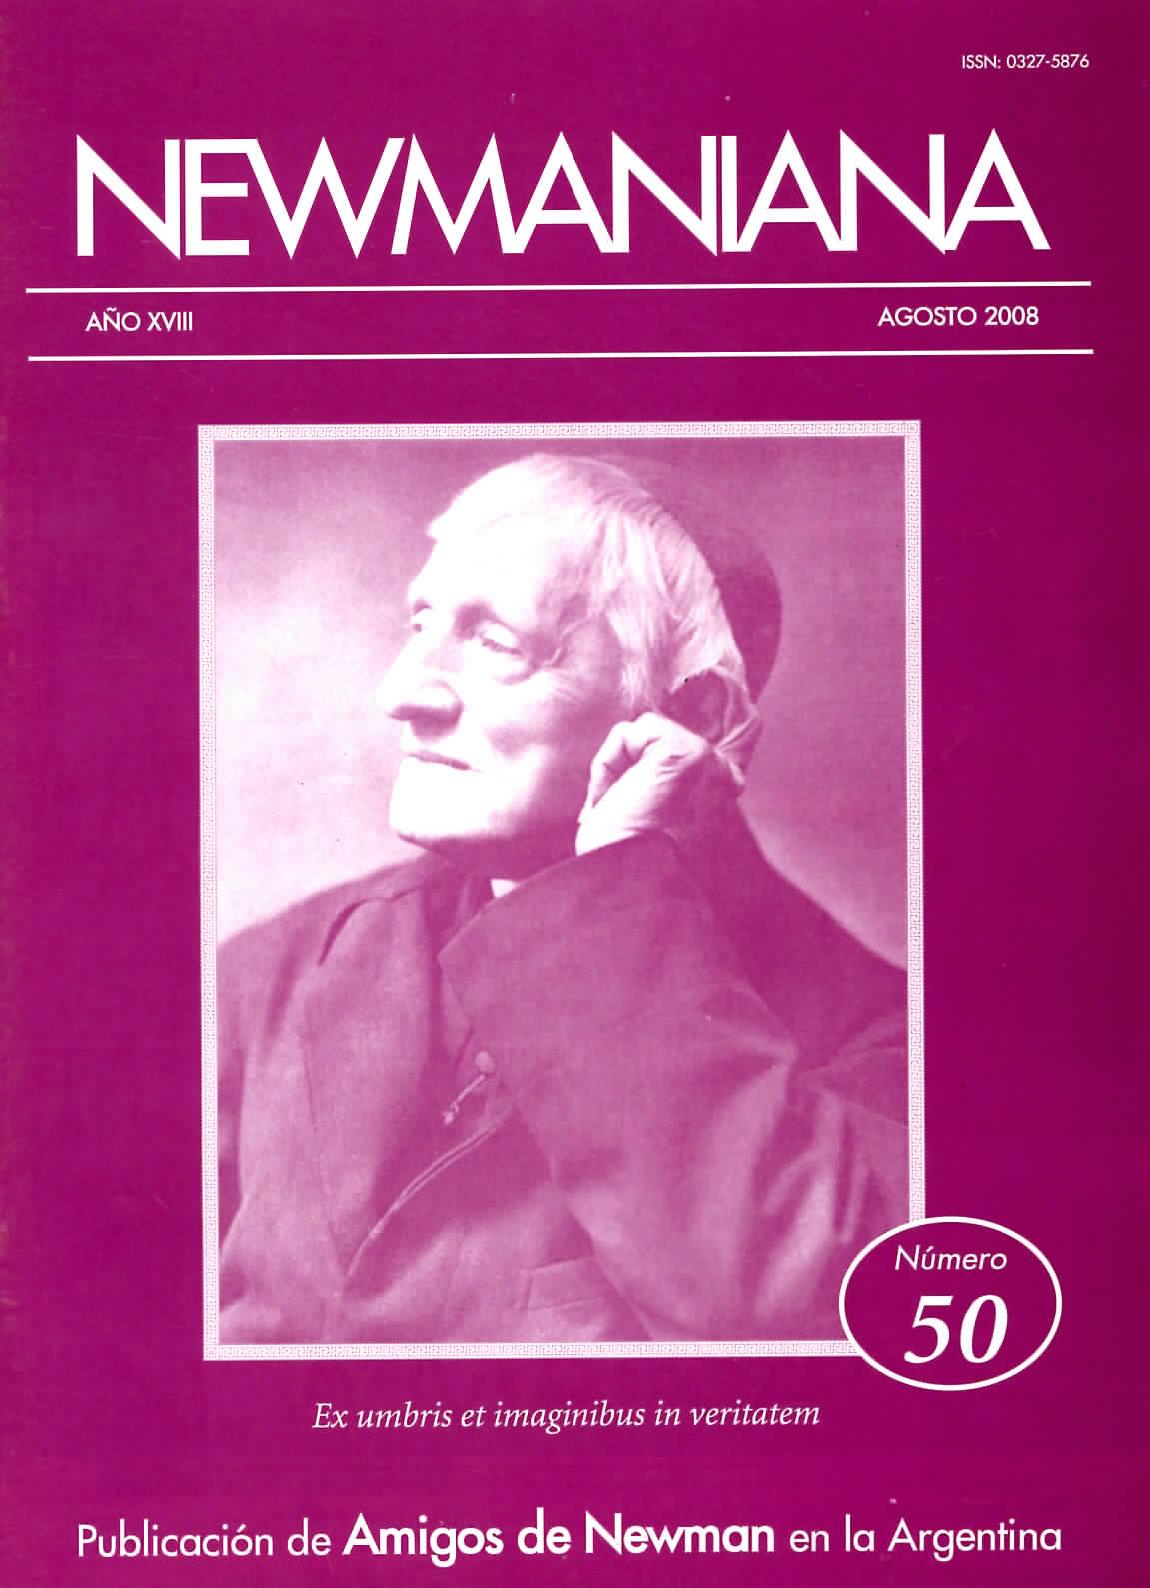 Revista Newmaniana N° 50 – Agosto 2008